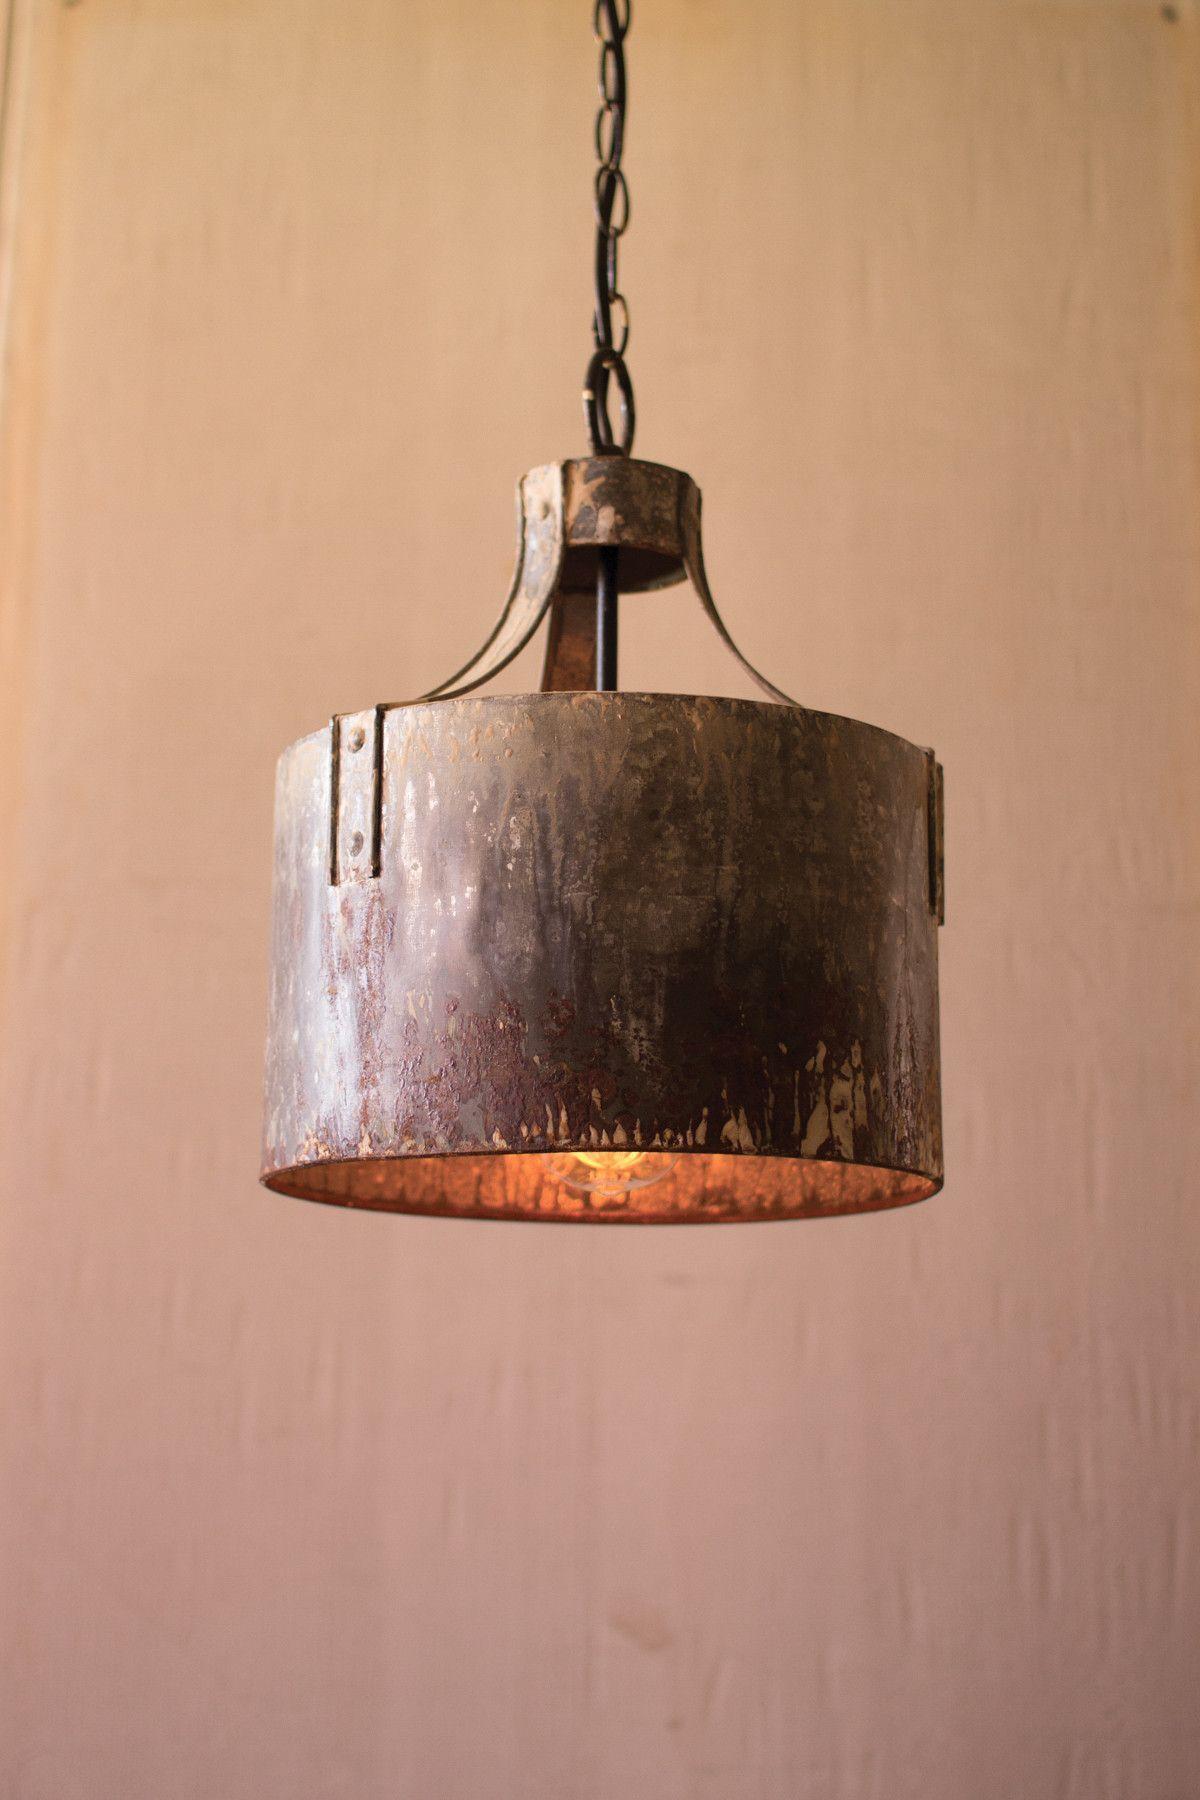 Metal Cylinder Pendant Light Rustic Light Fixtures Rustic Pendant Lighting Cylinder Pendant Light